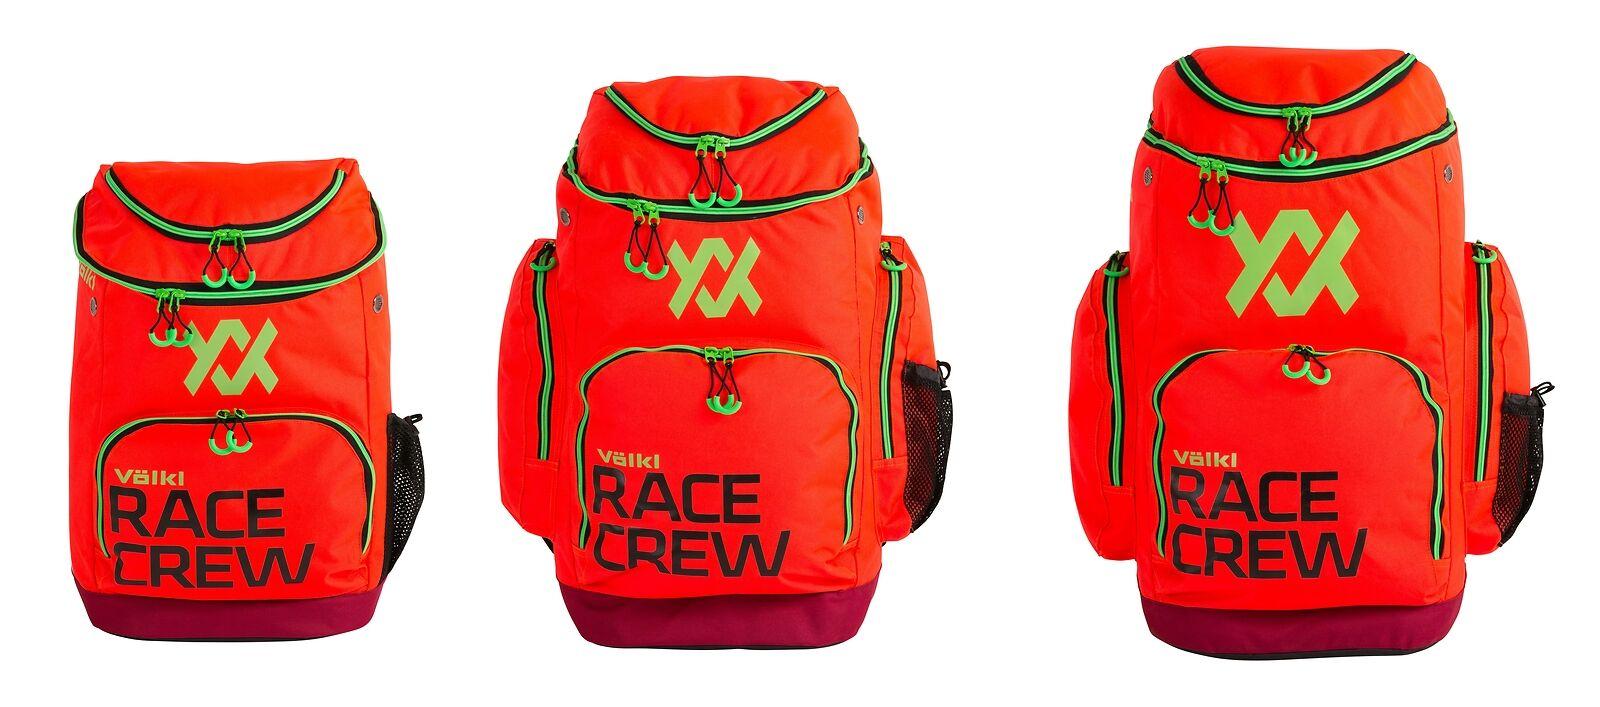 Völkl Race squadra Backpack 201920  Skischuh Borsa Zaino